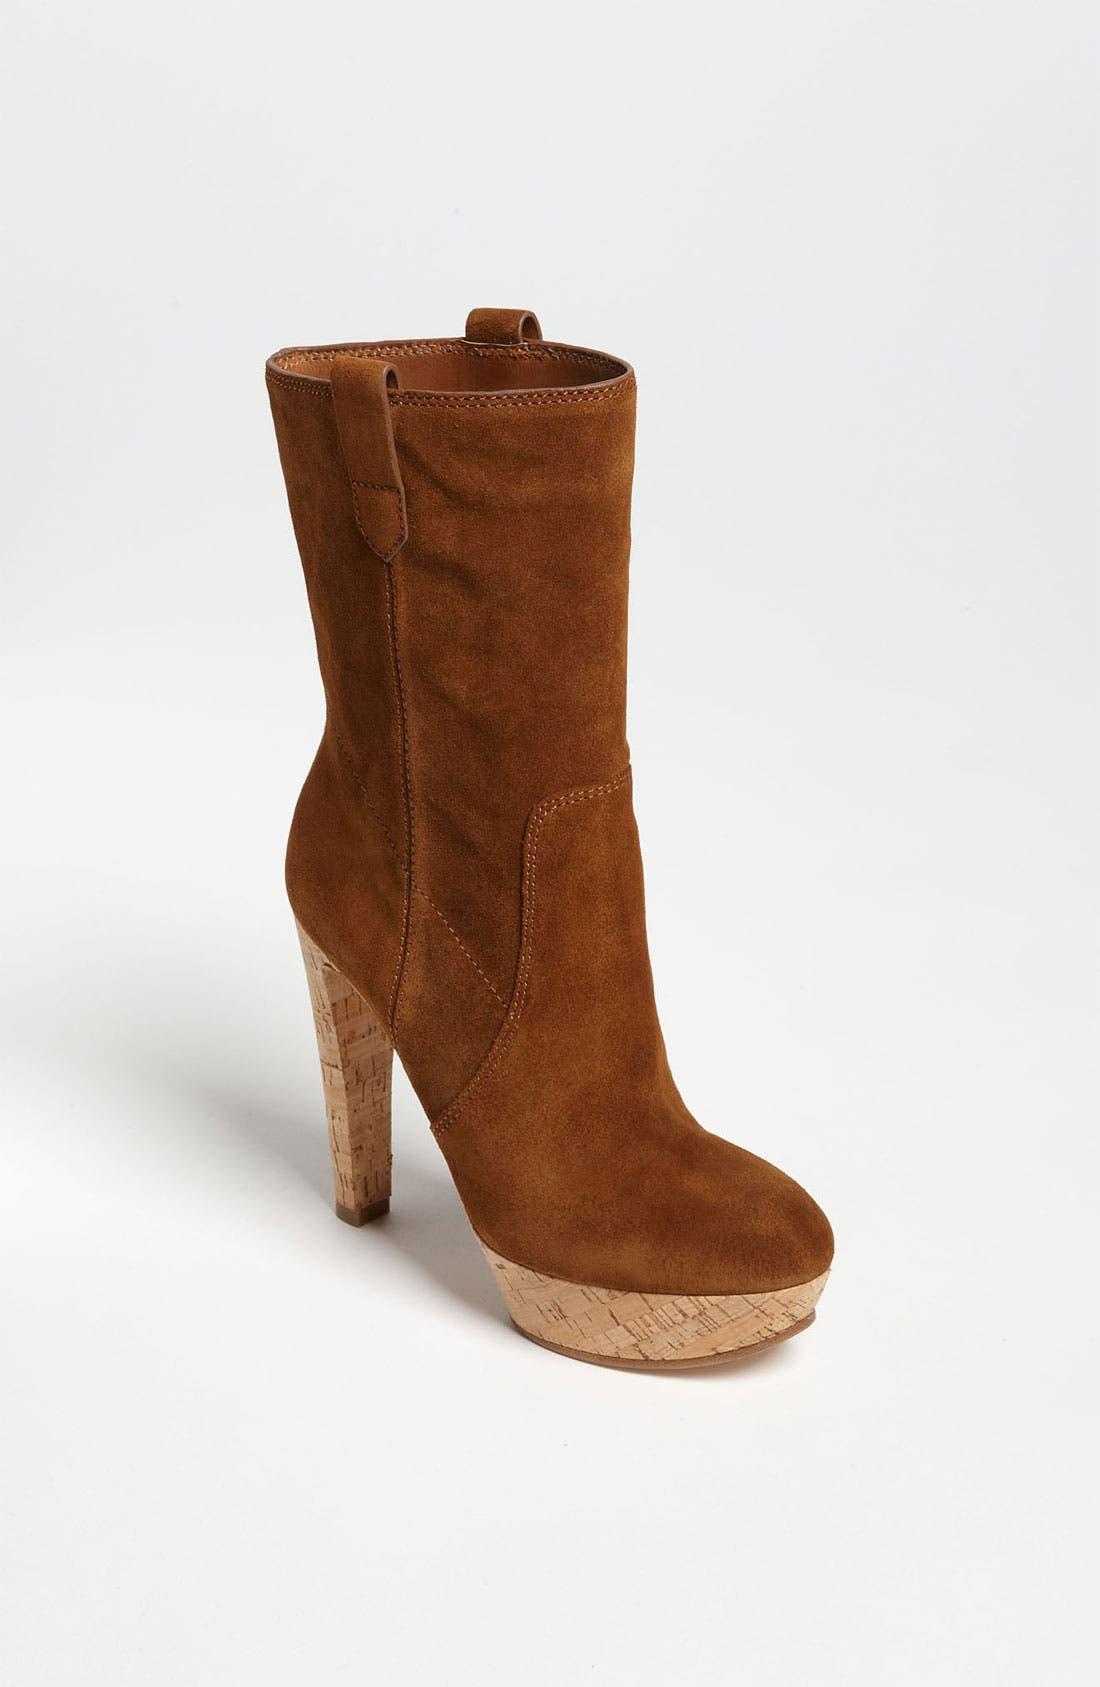 Alternate Image 1 Selected - KORS Michael Kors 'Brielle' Boot